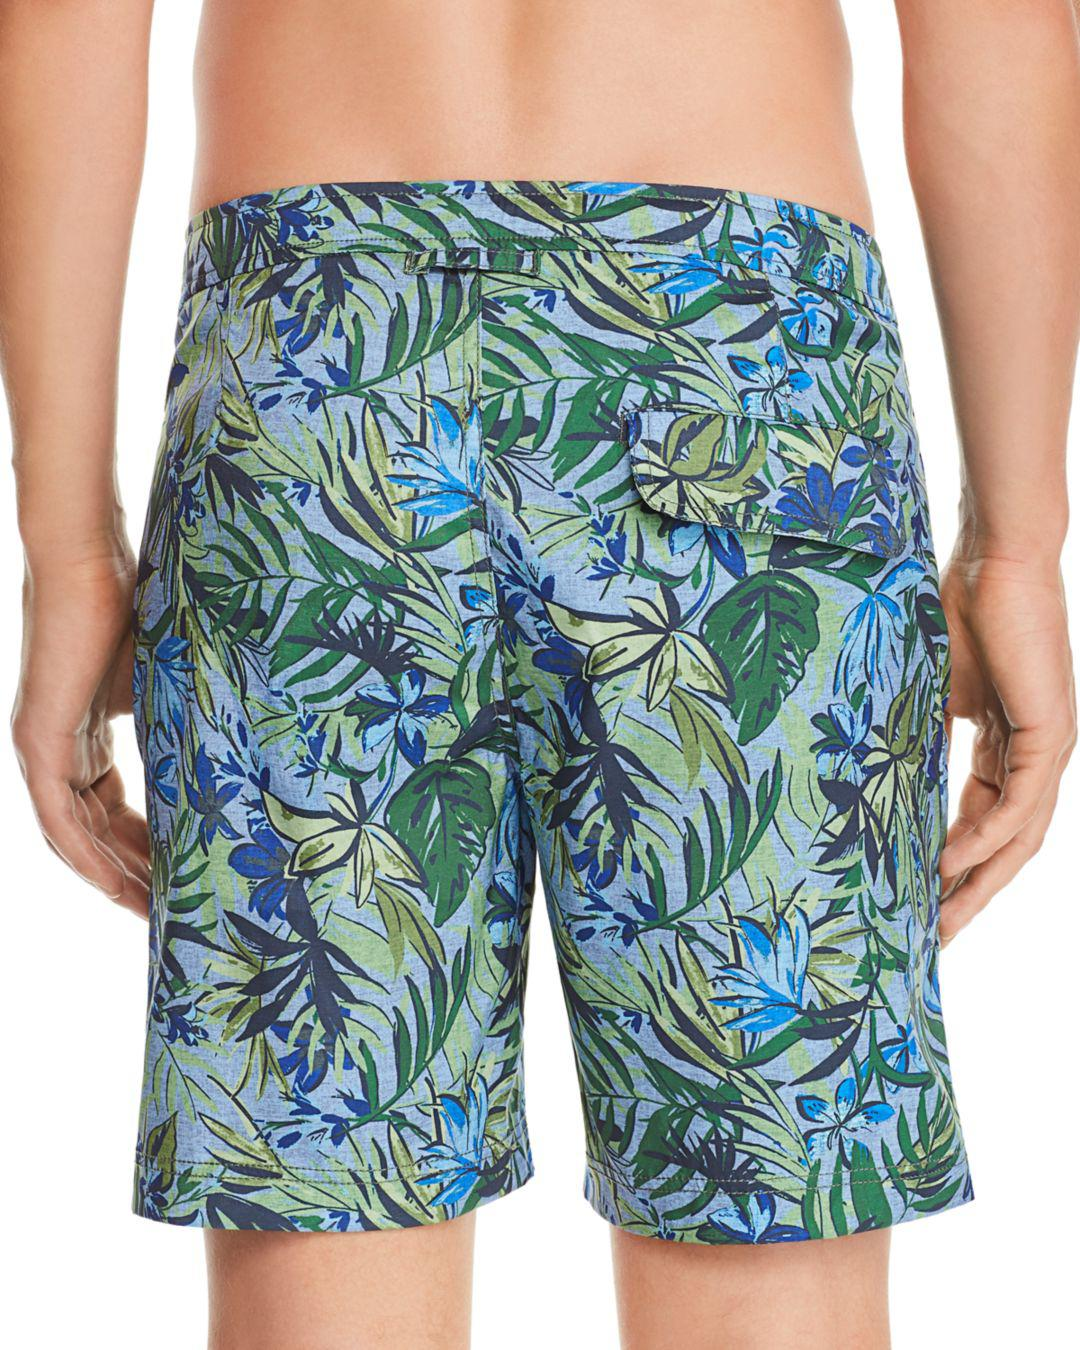 58f9a2233f Onia Calder Tropical-print Swim Trunks in Blue for Men - Lyst